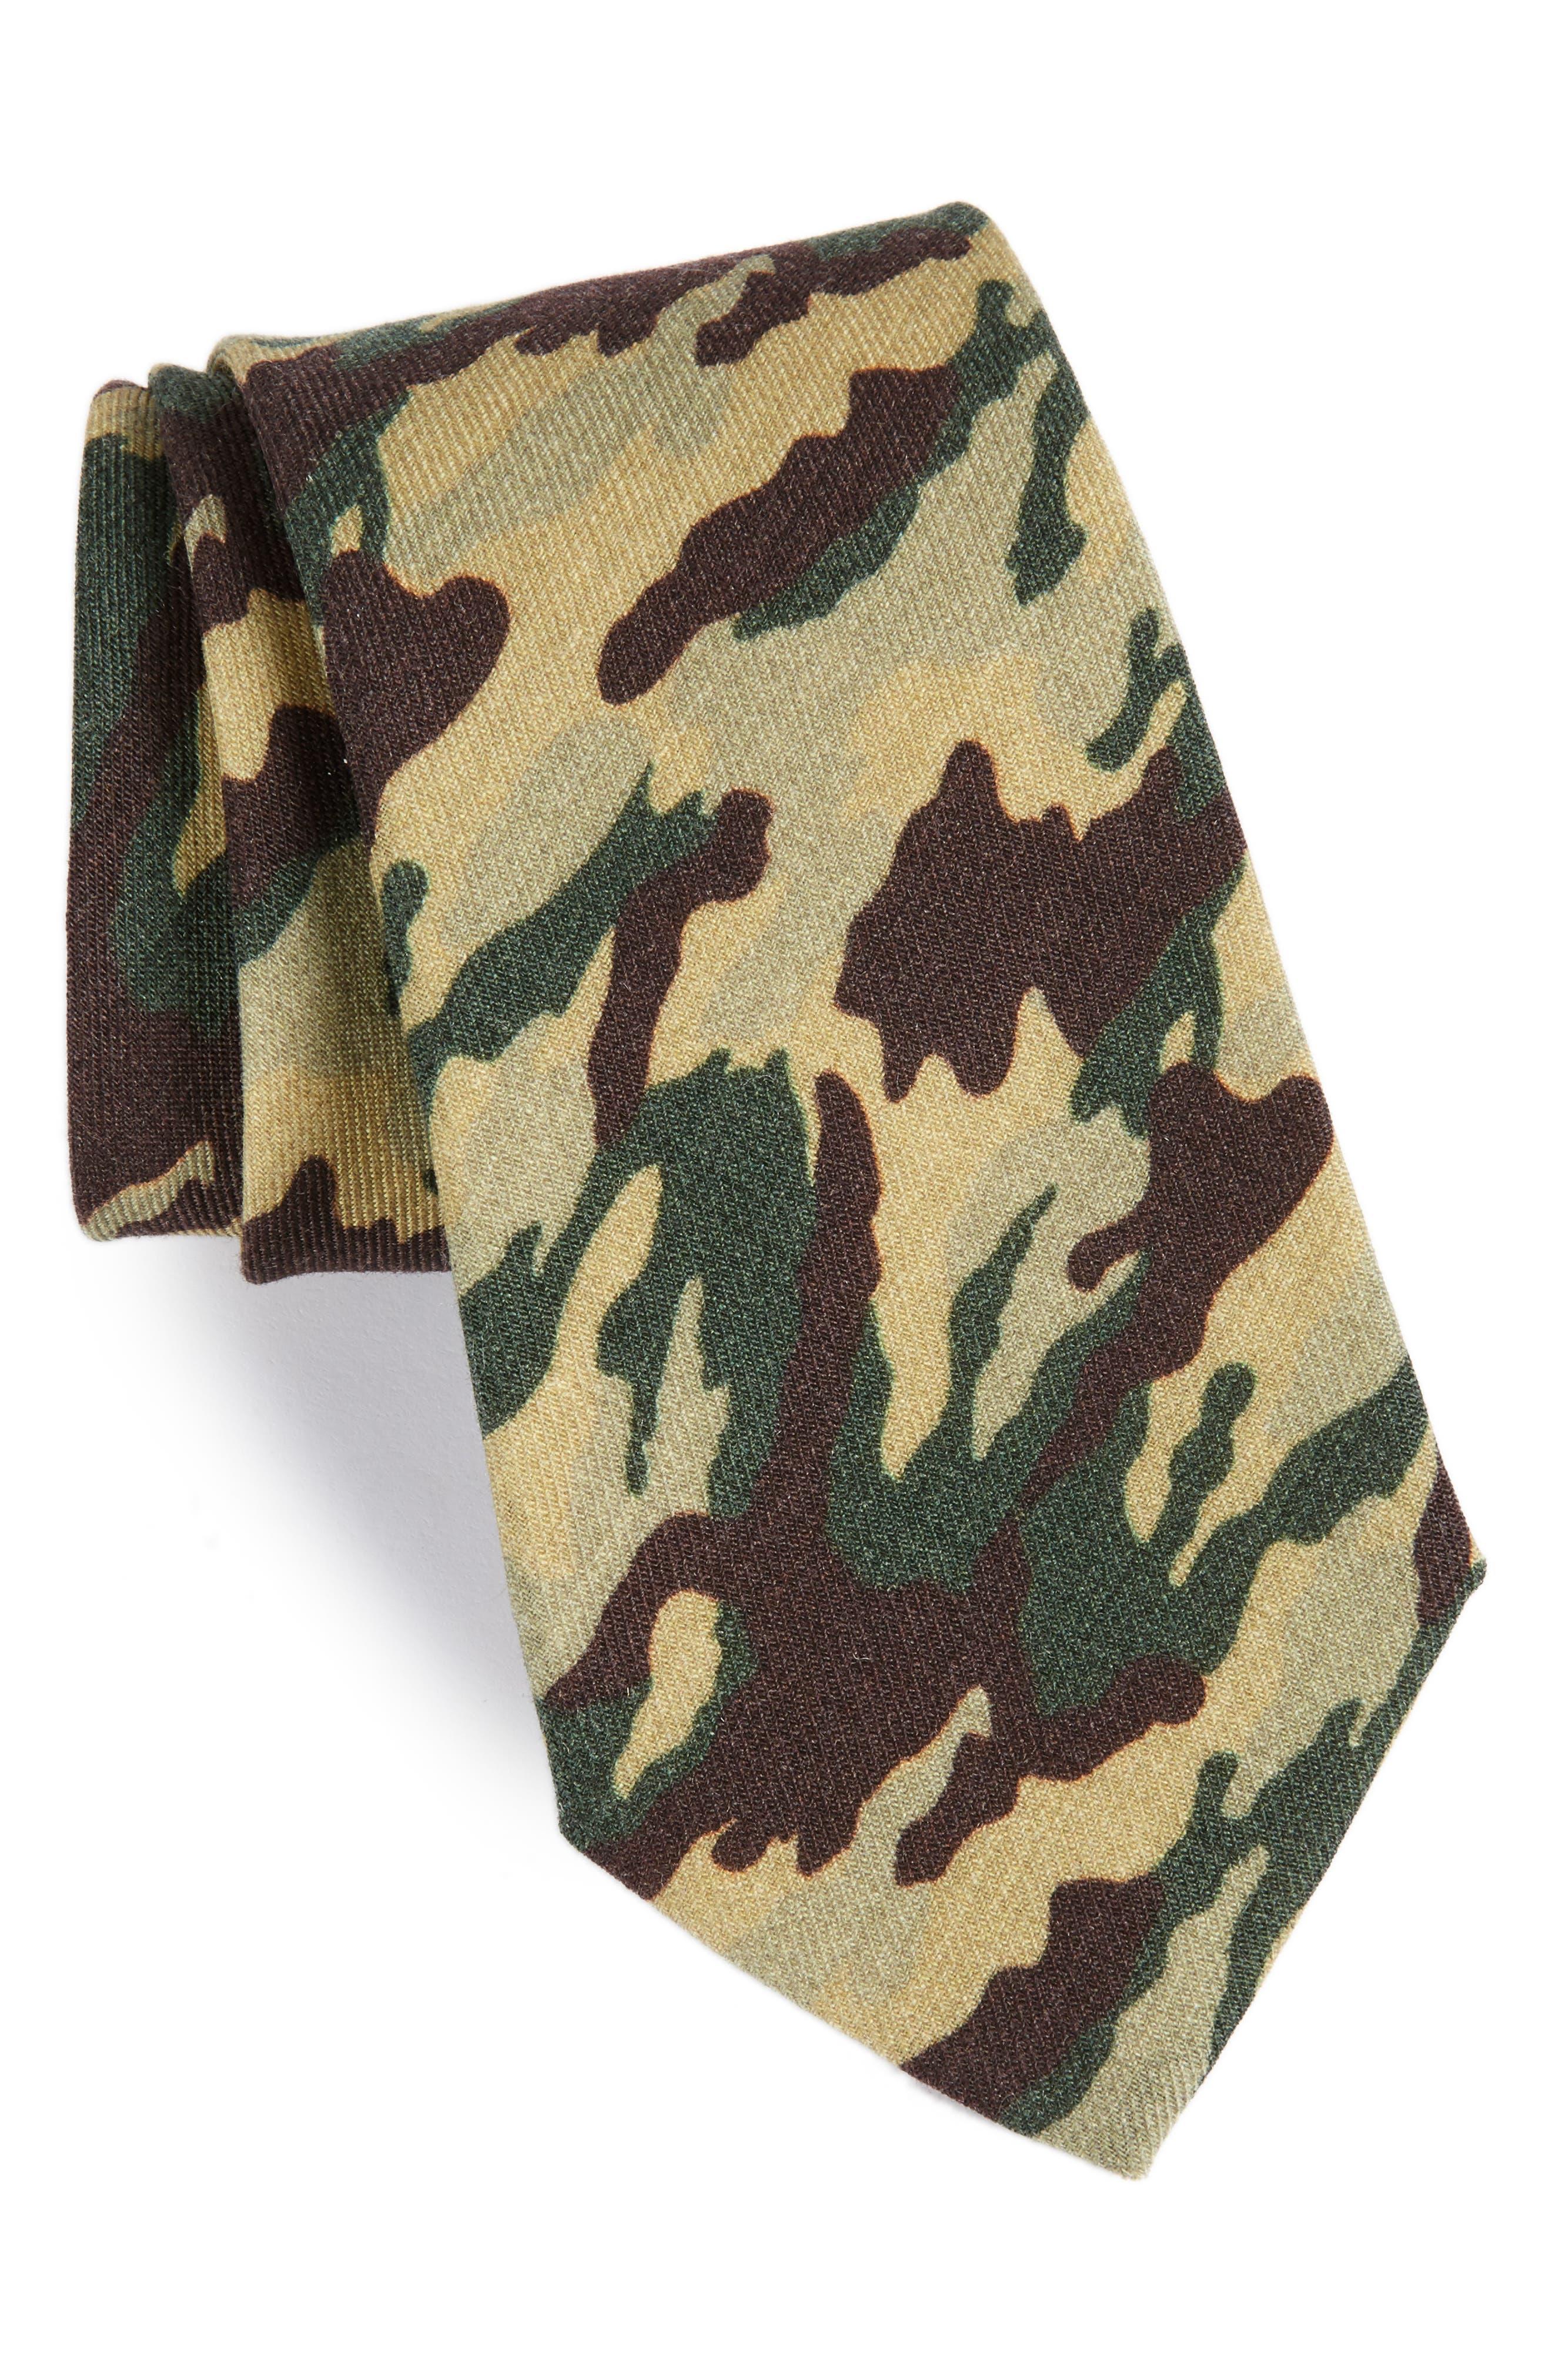 Main Image - Michael Bastian Camo Print Wool Tie